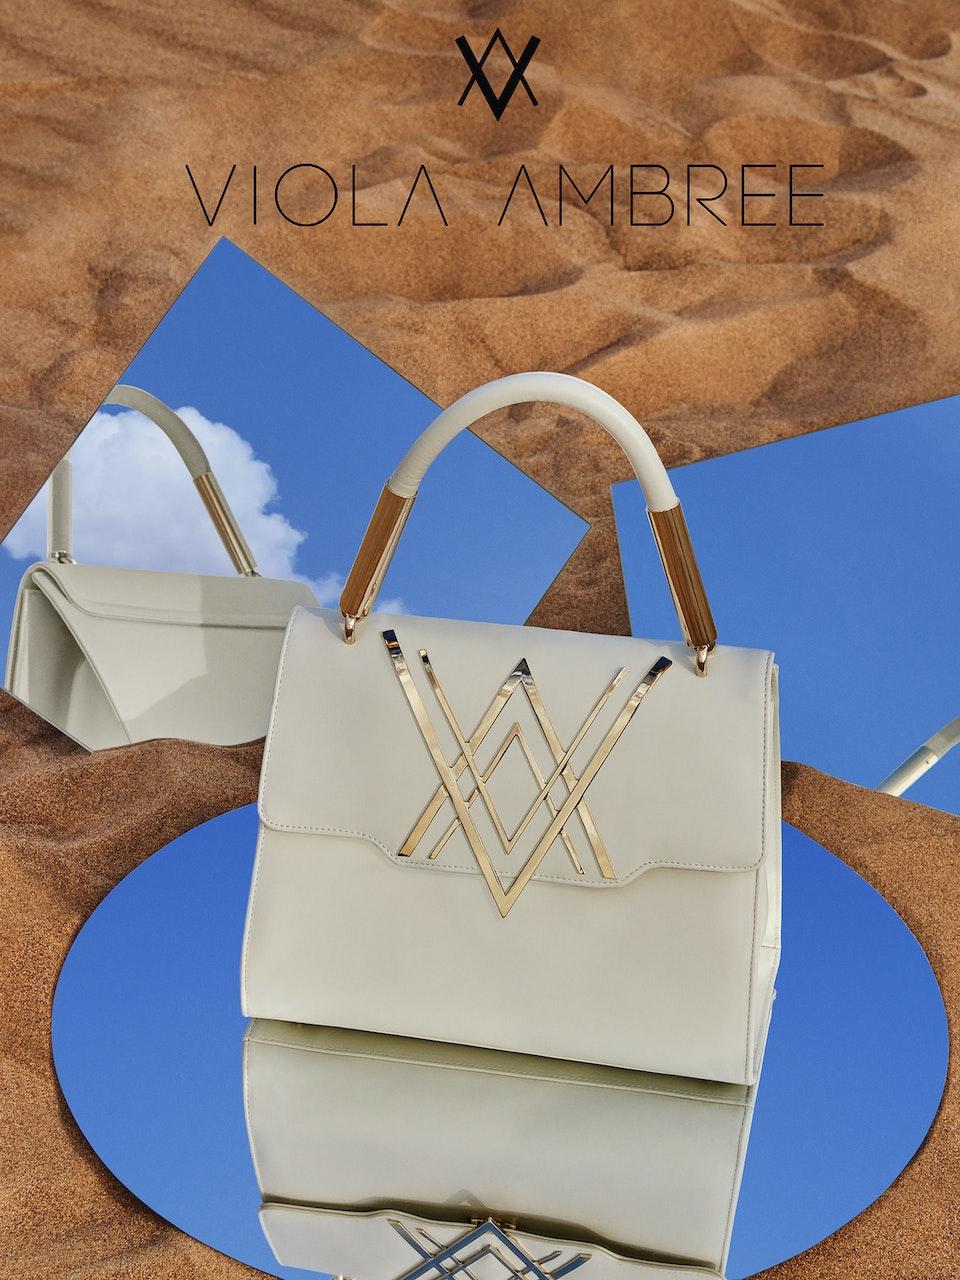 Maison Viola Ambree